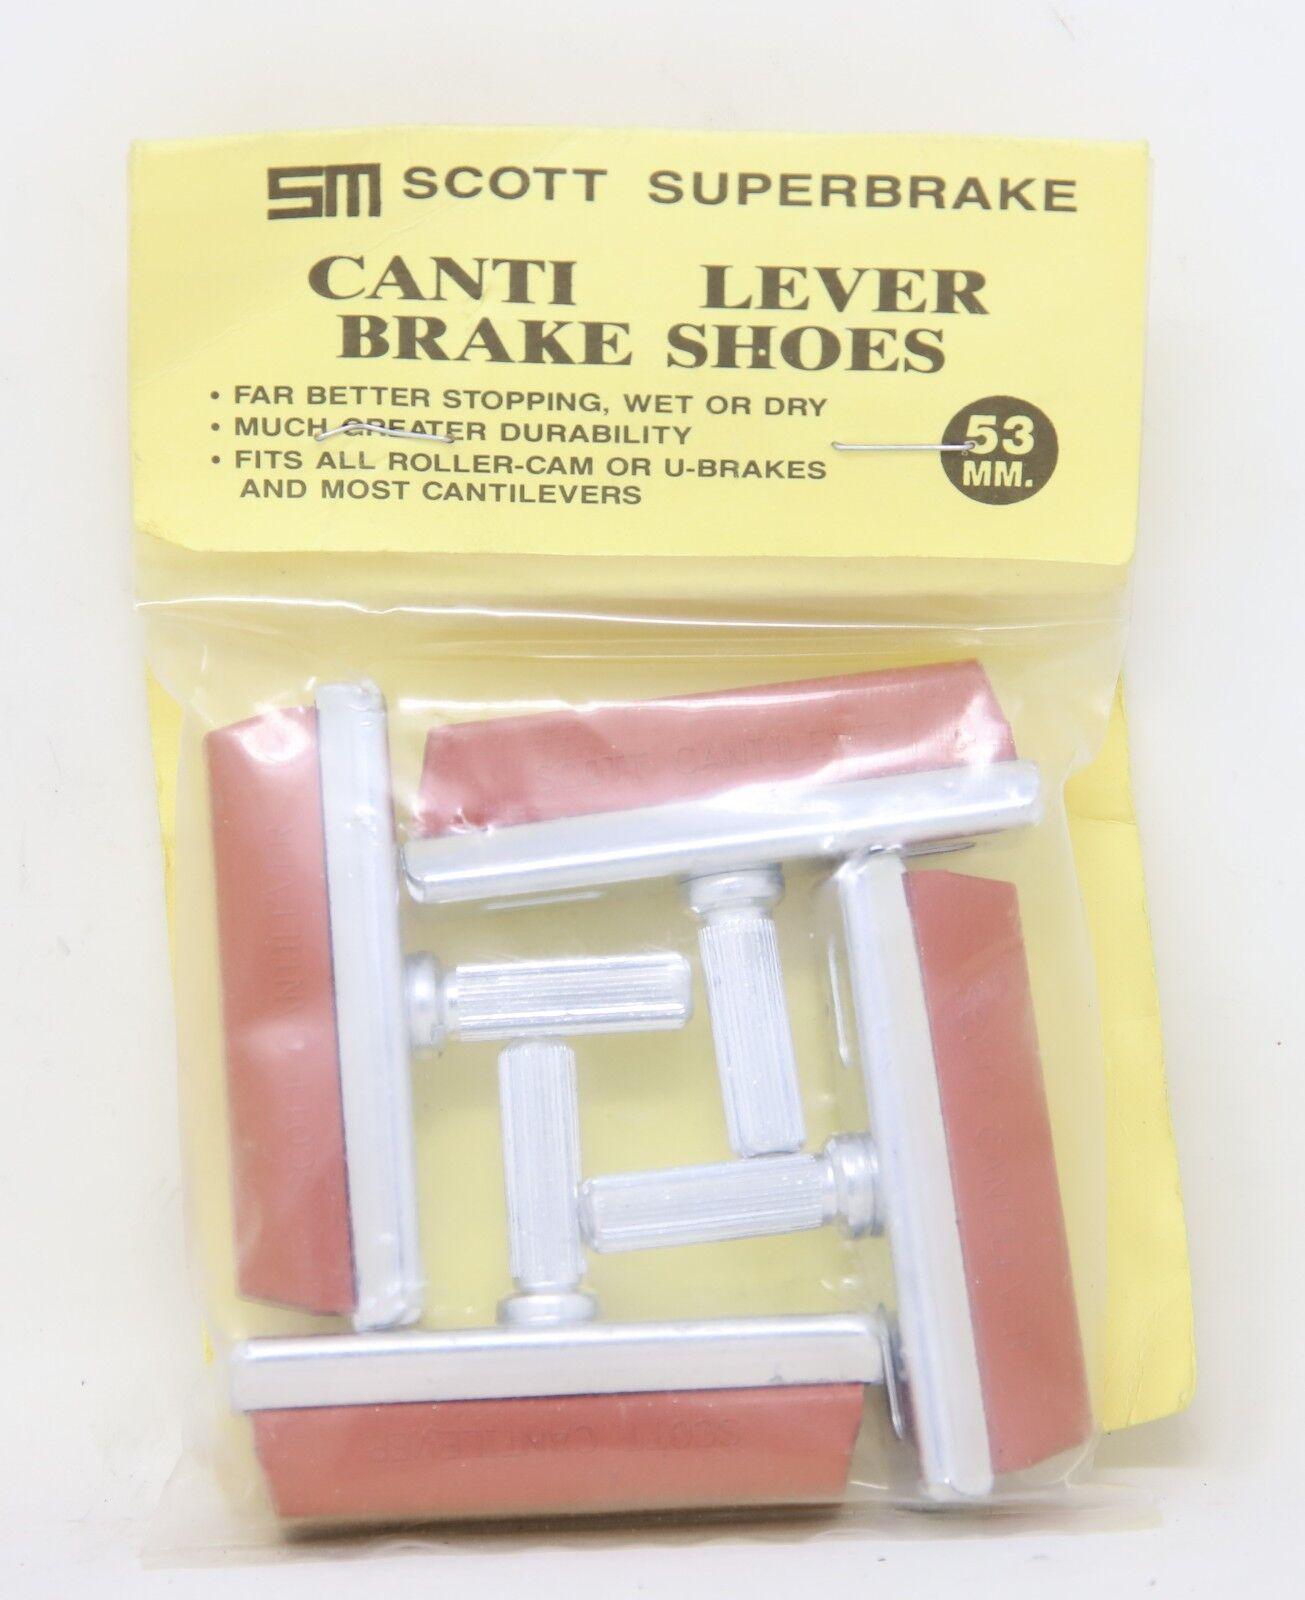 NOS SCOTT MATHAUSER BRAKE PADS ROLLERCAM U-BRAKE CANTILEVER  MTB BMX - NIP